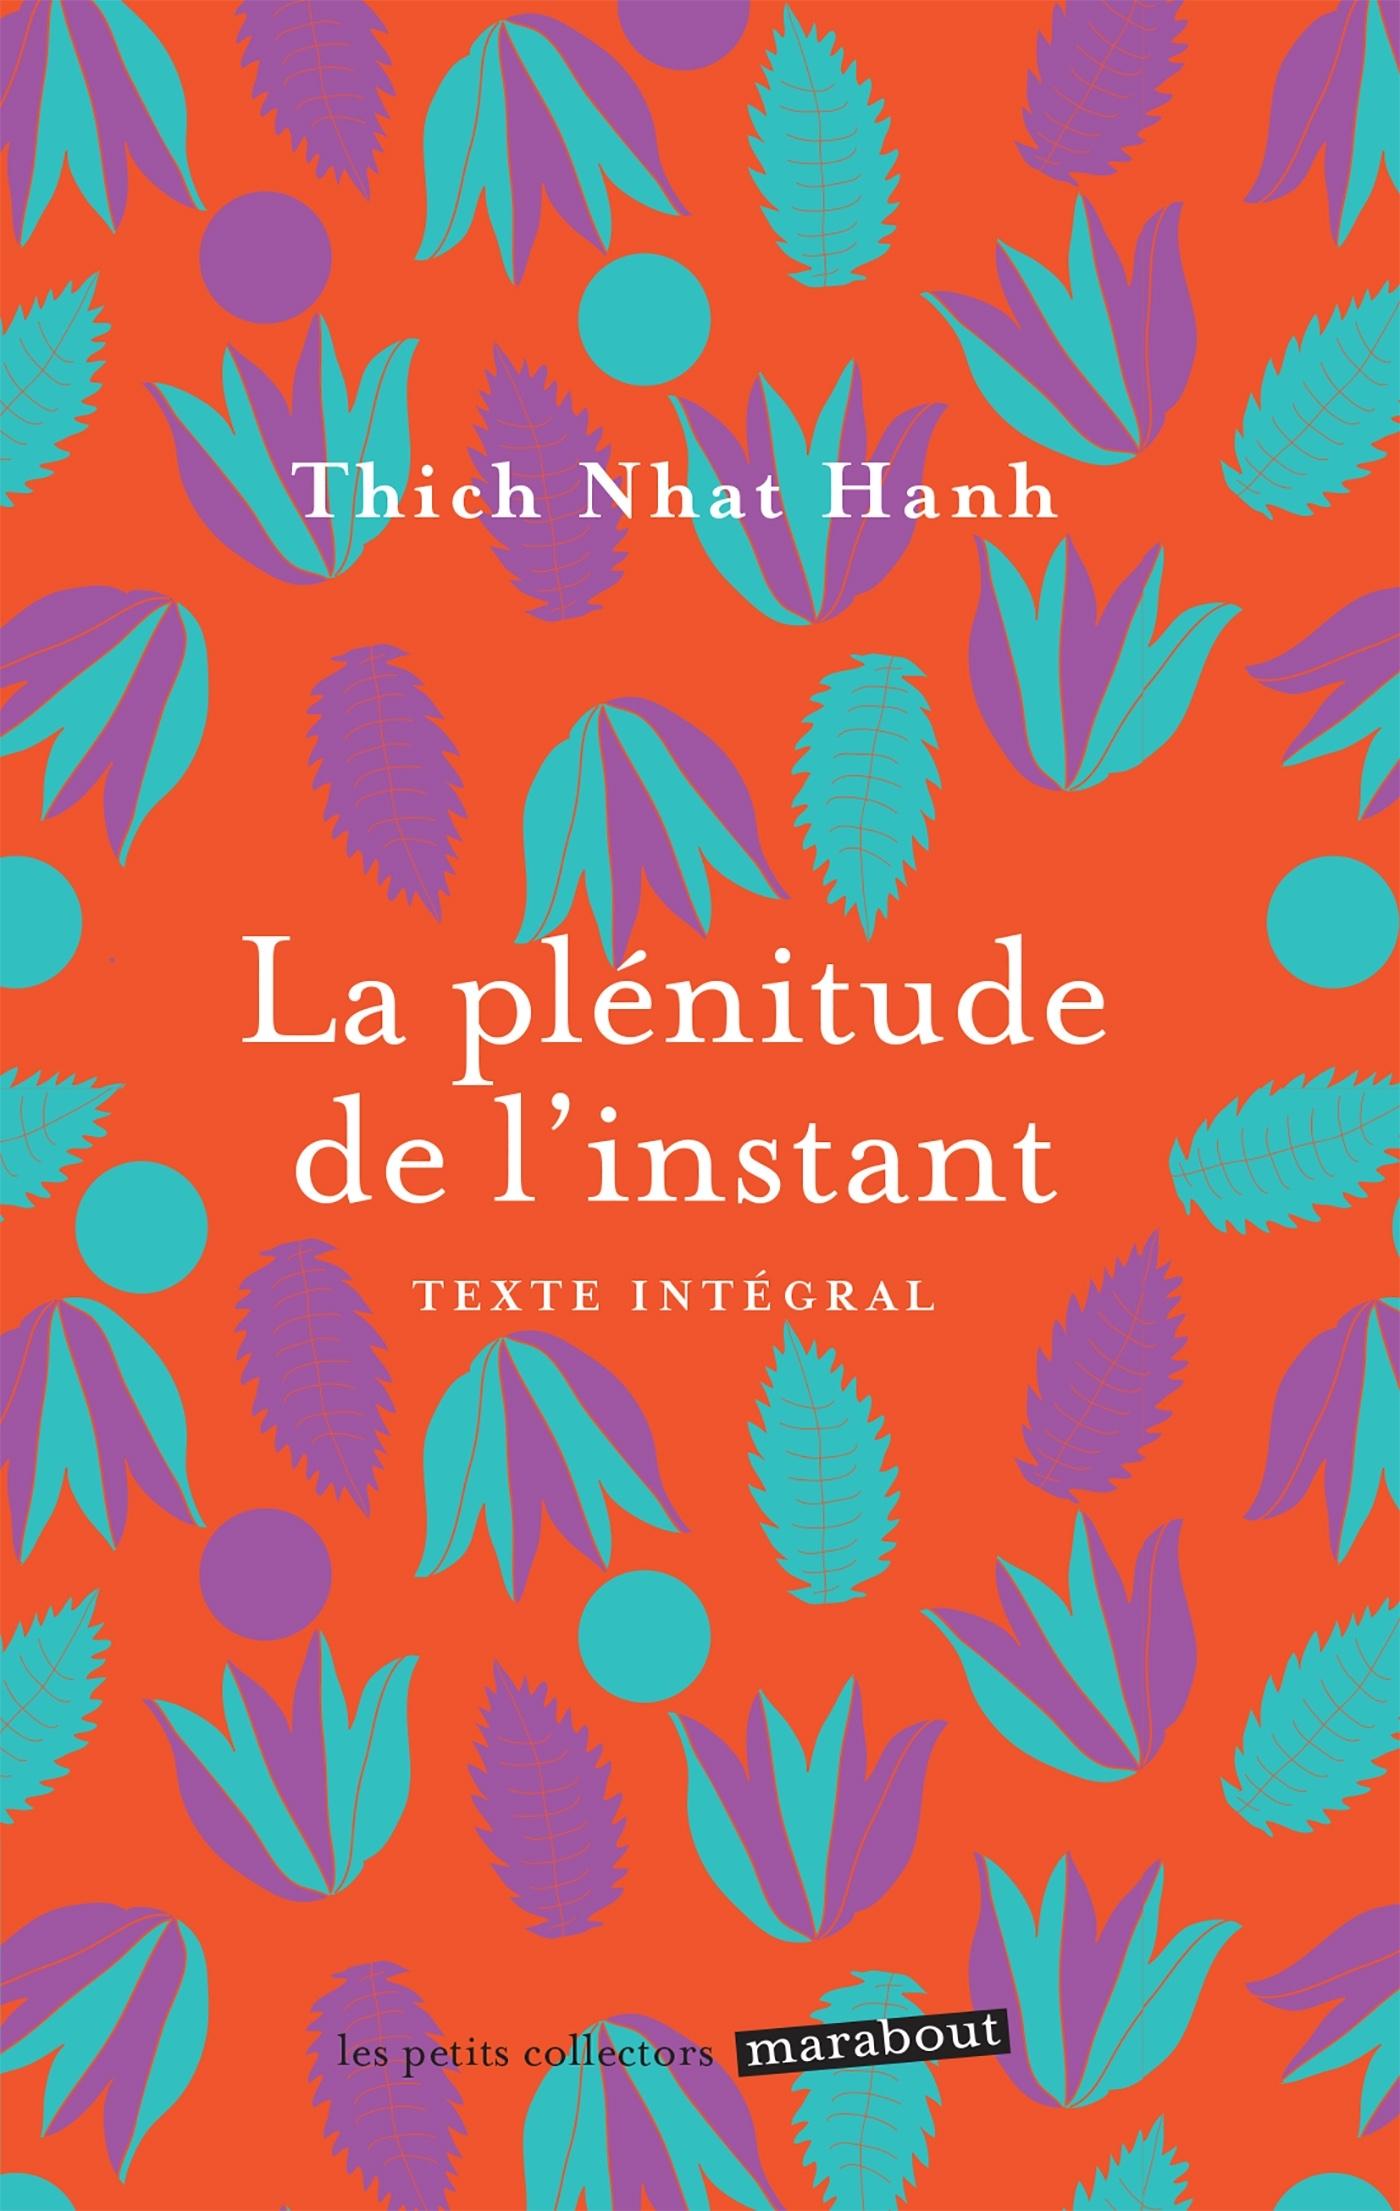 LA PLENITUDE DE L'INSTANT